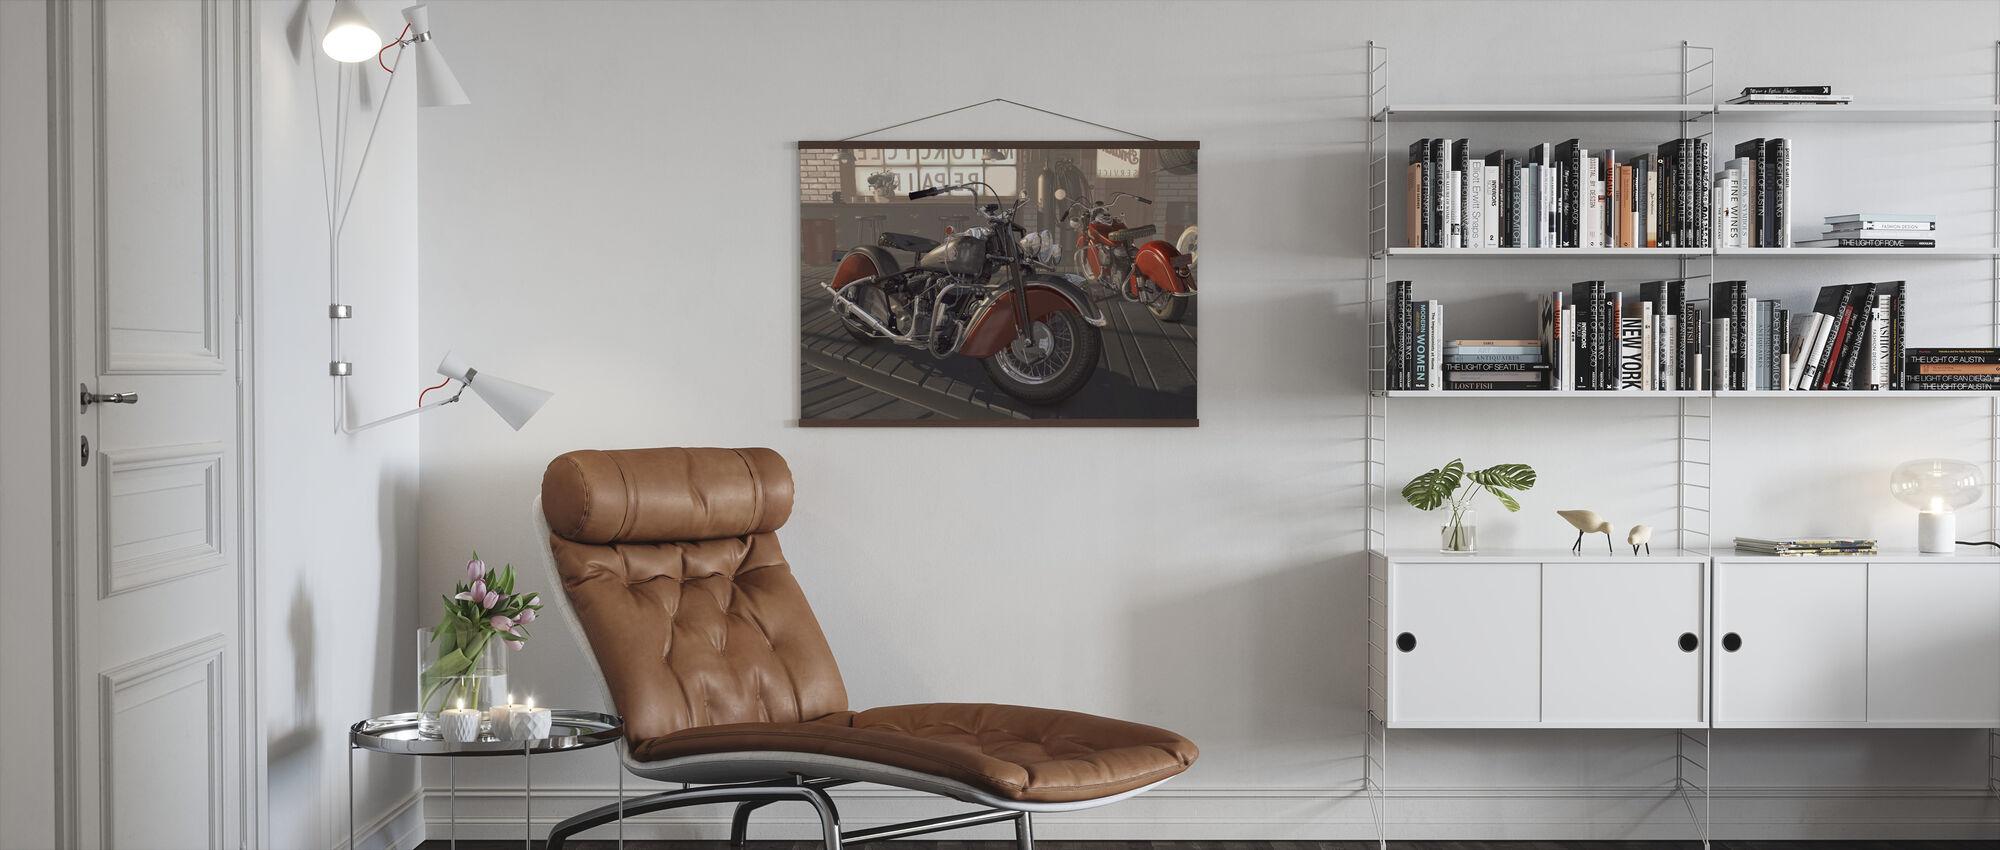 Indian Tipi - Poster - Living Room